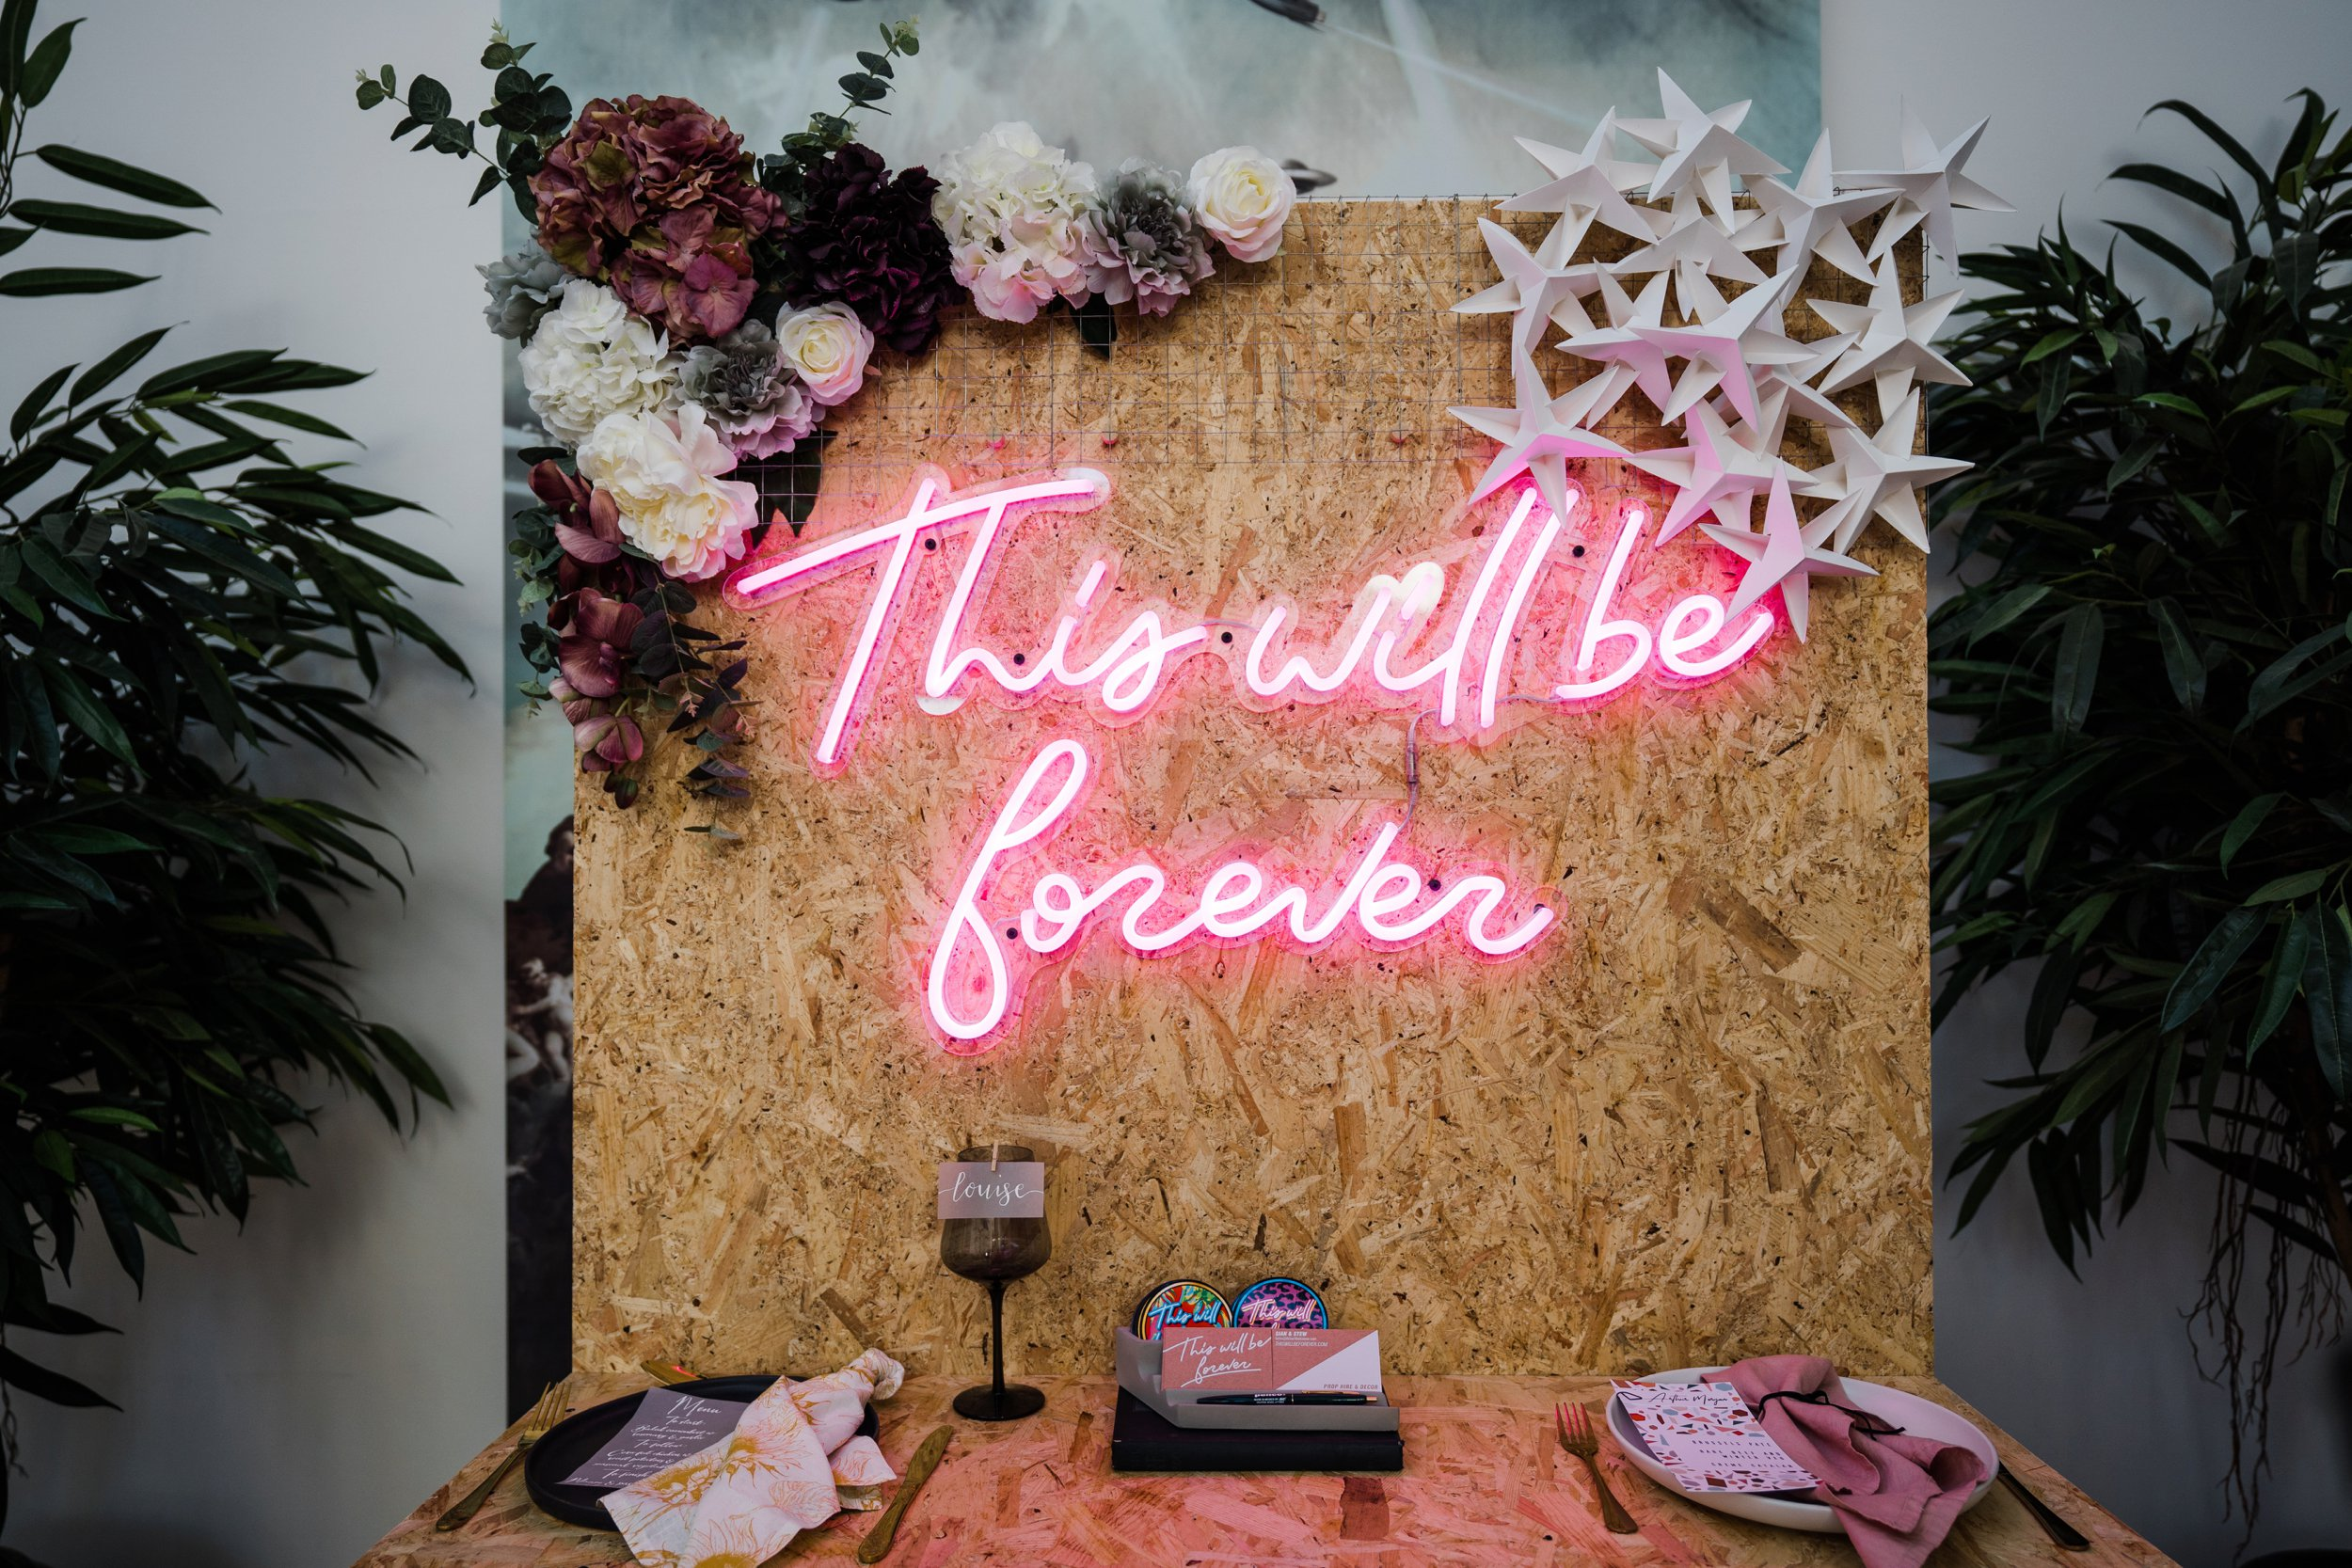 The UN-WEDDING SHOW 2019 cool bride style modern wedding fair Birmingham Fazeley Studios 00010.jpg